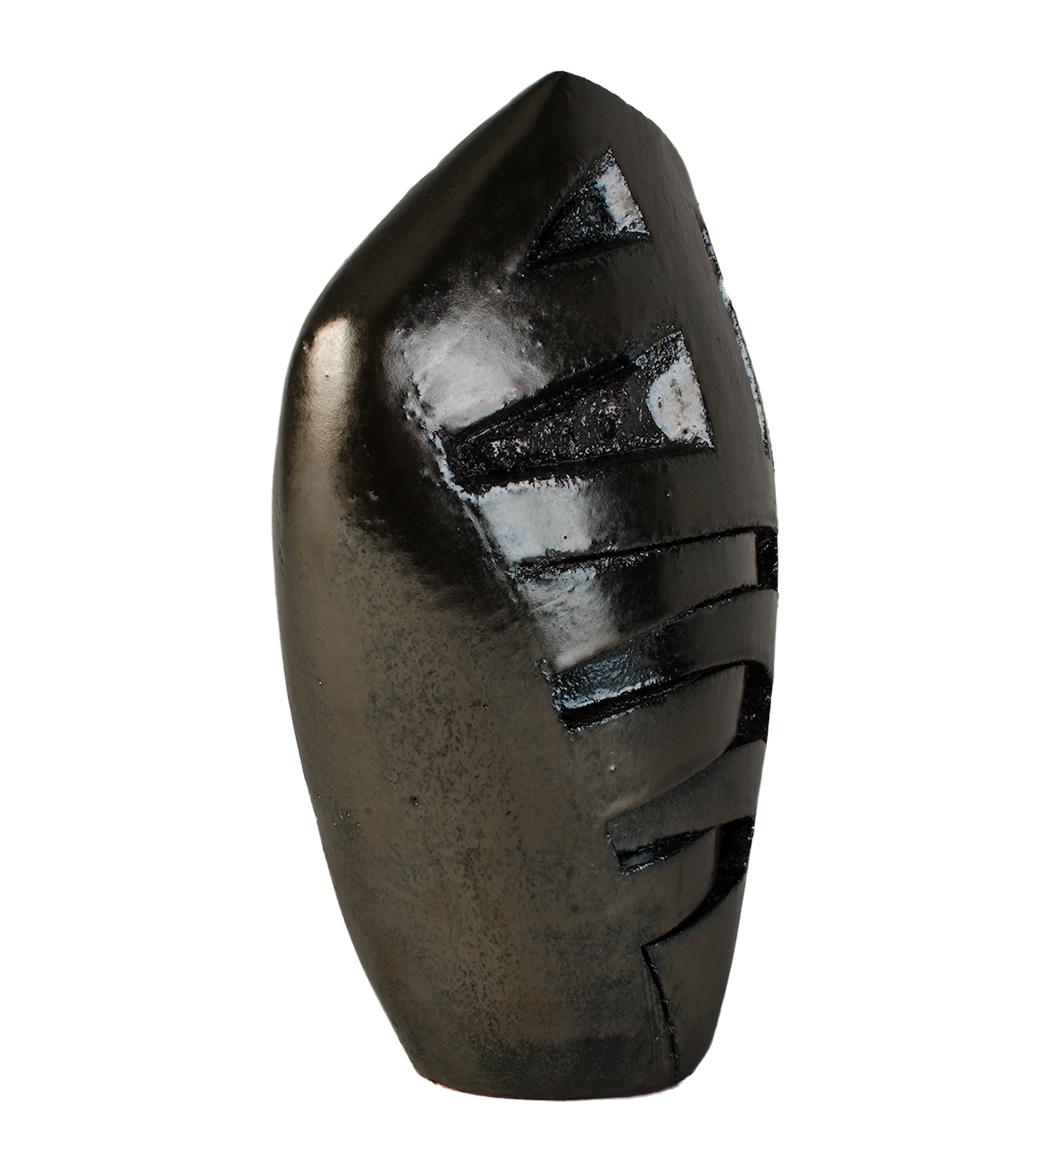 Budge-Puncture-Shield-2.jpg